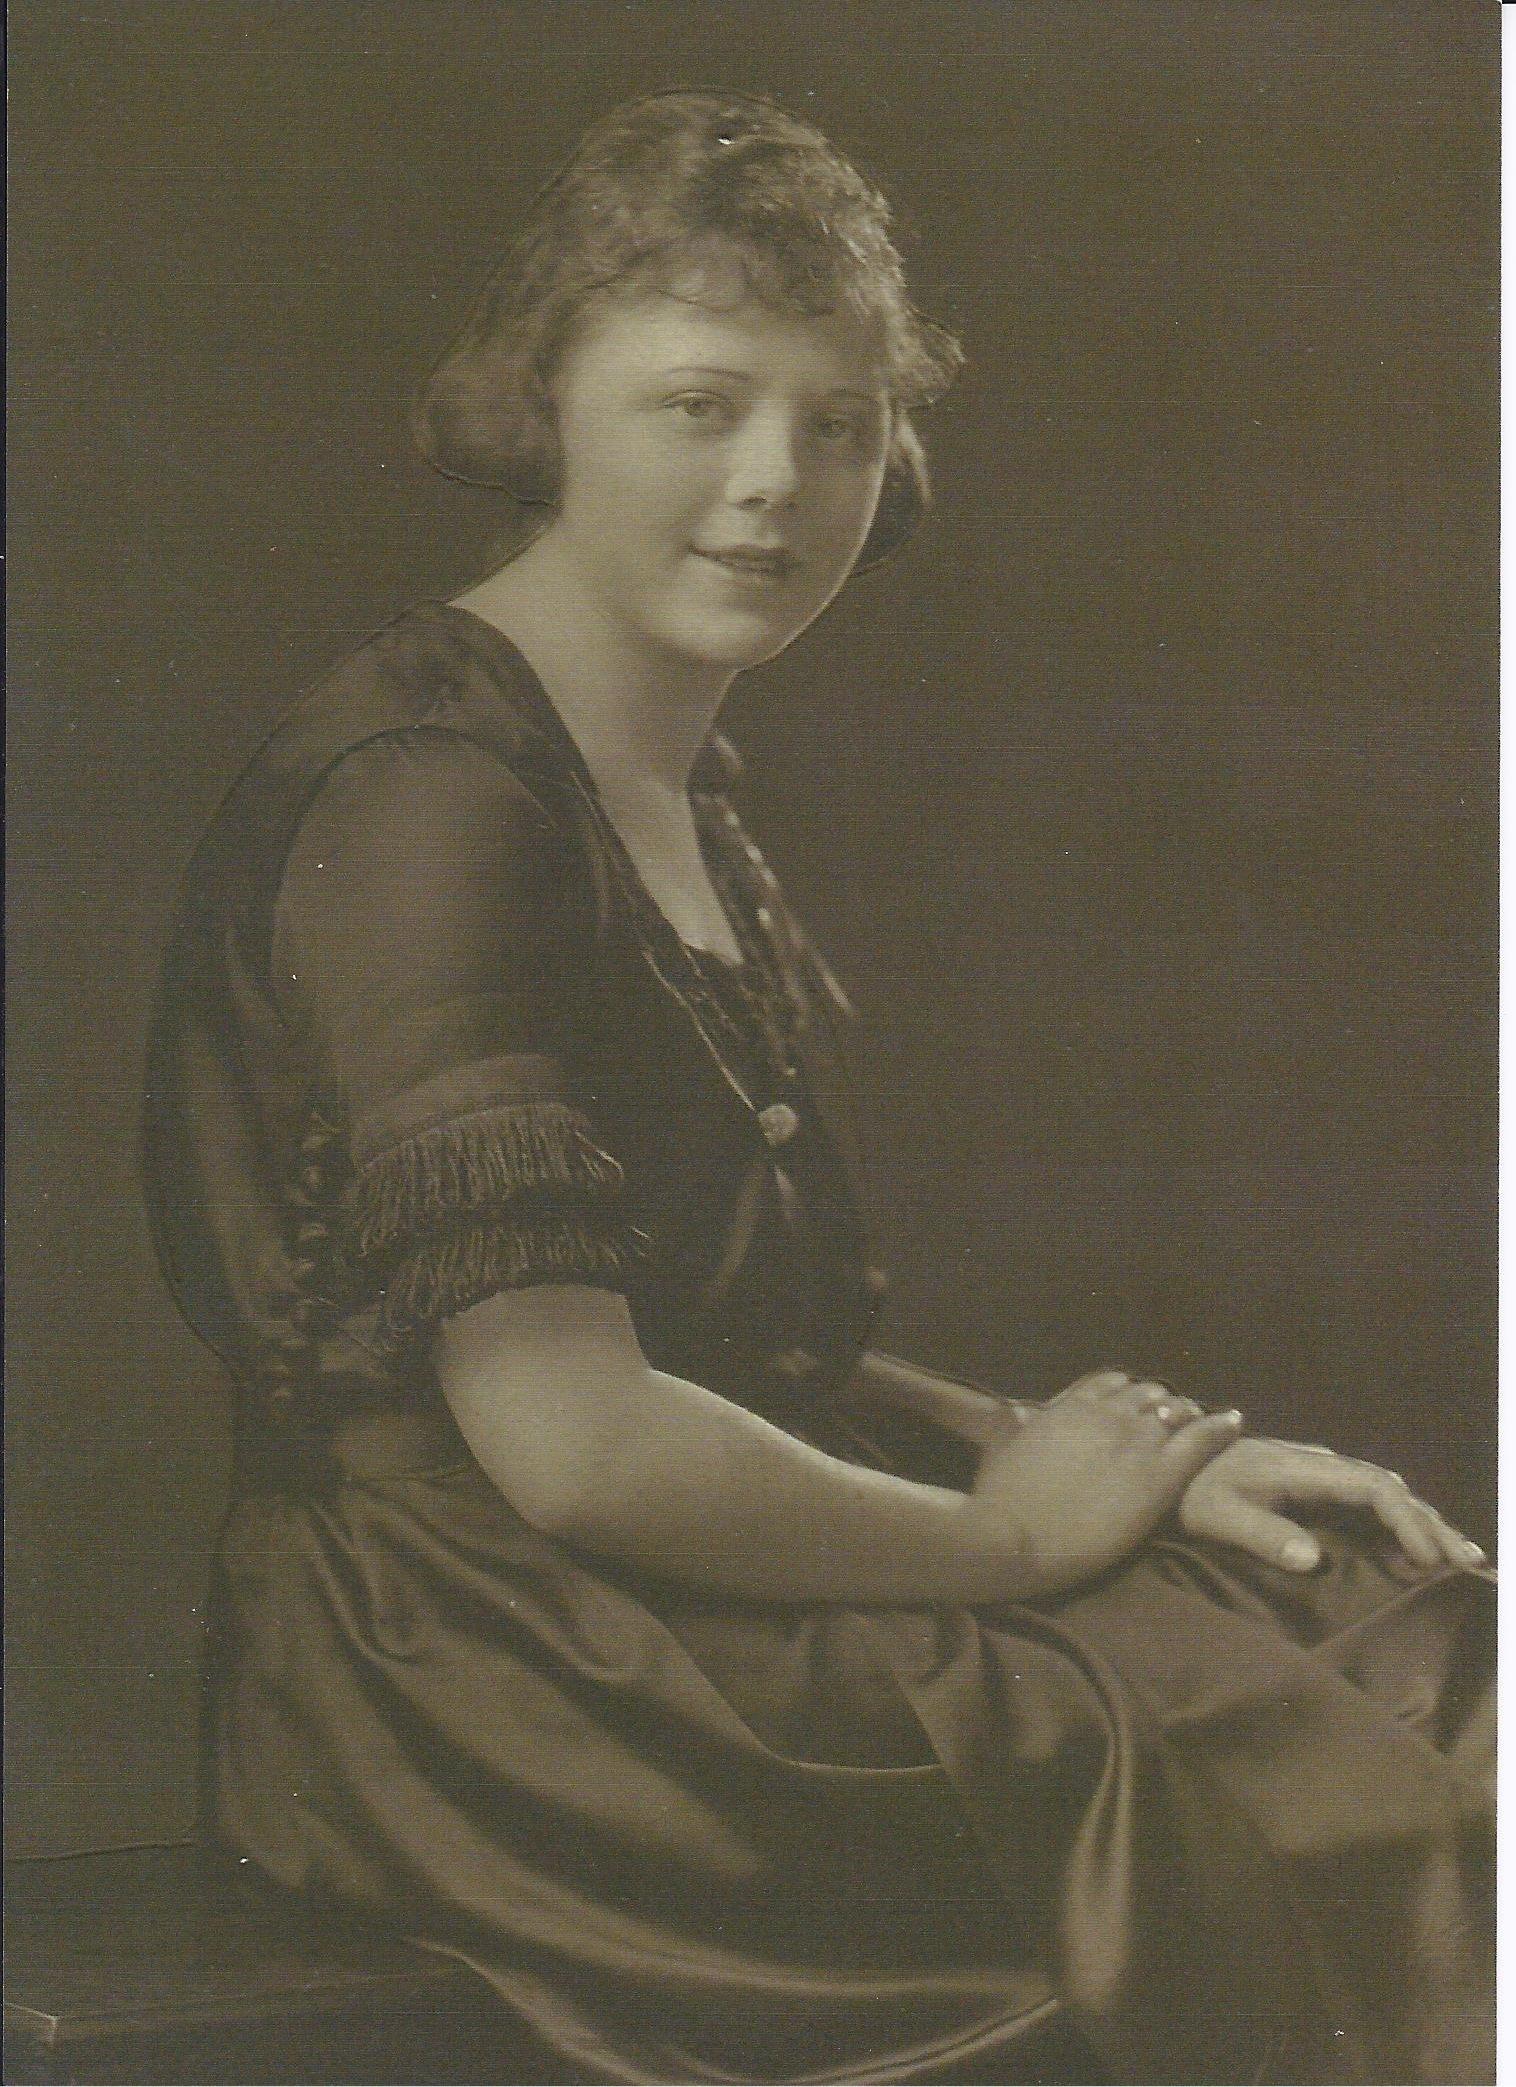 Lillian Byer circa 1918